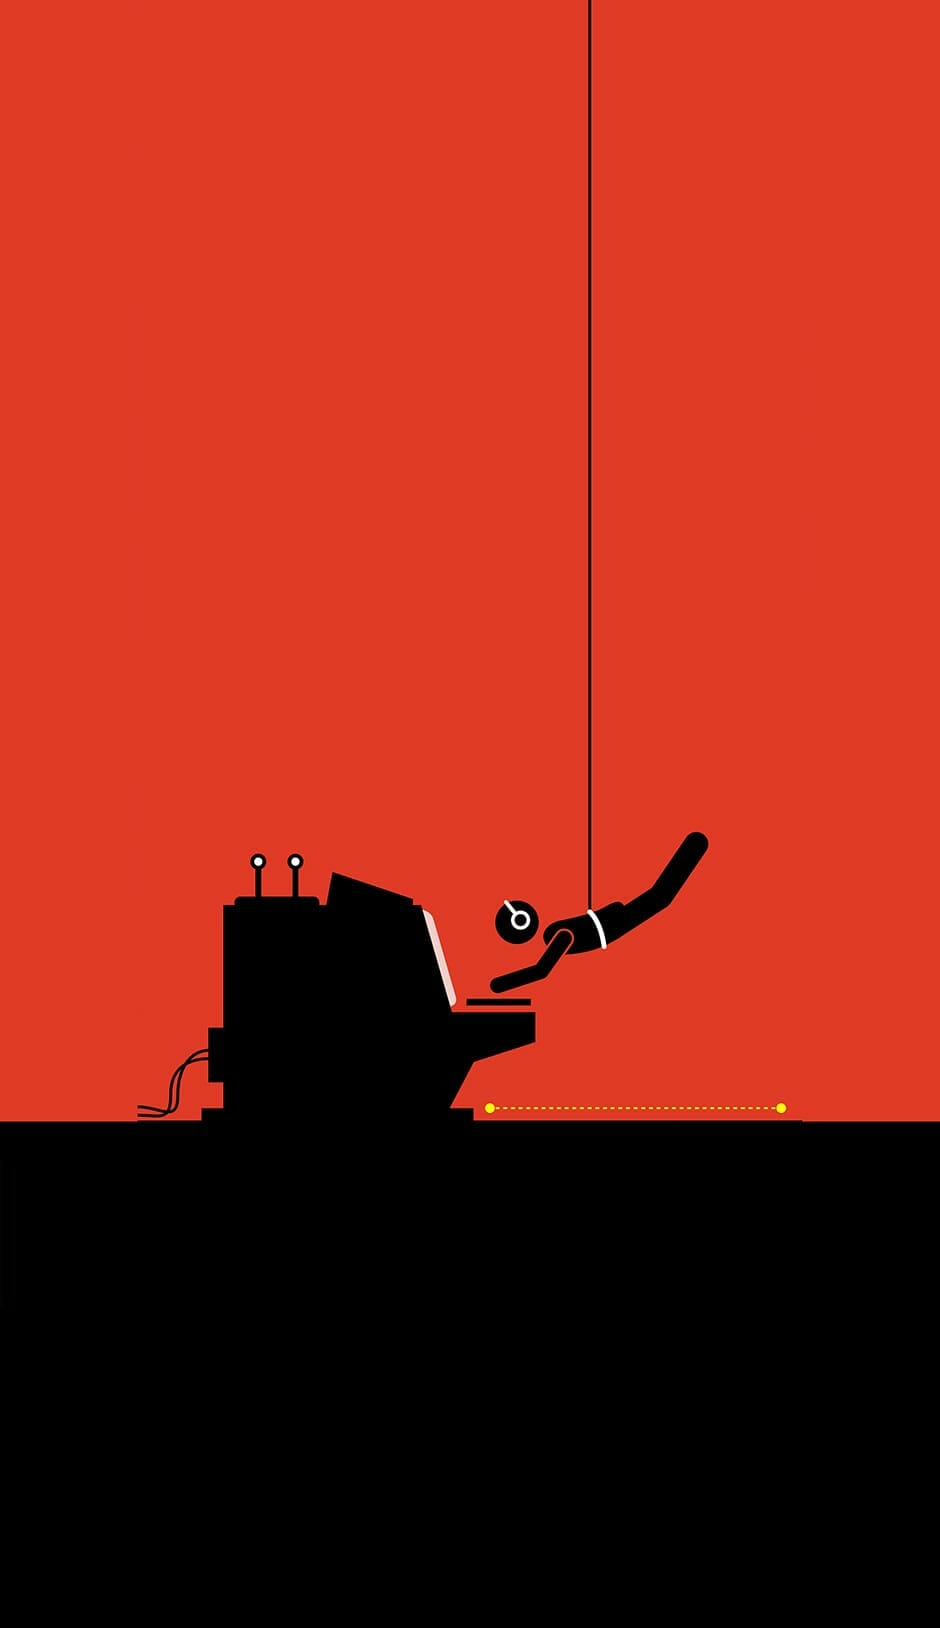 Mission Impossible illustration